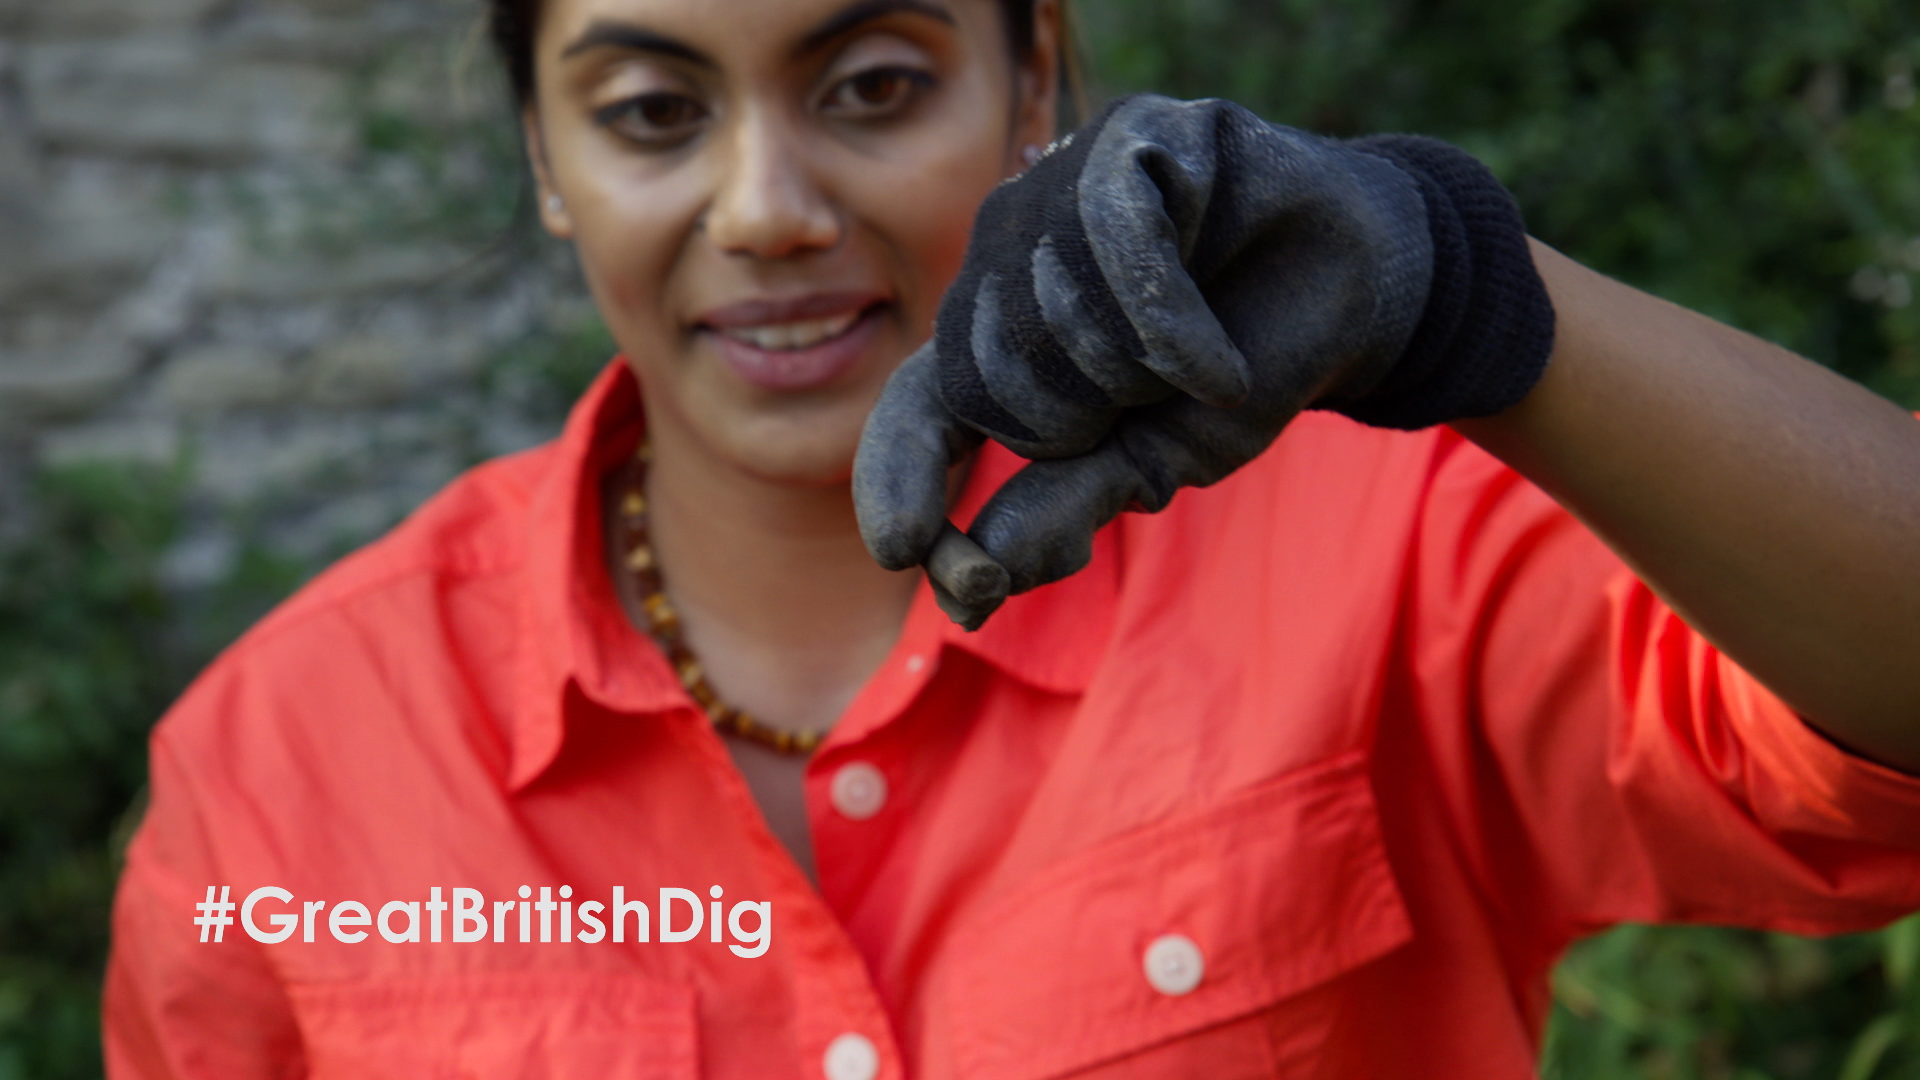 Natasha Billson & The Great British Dig!